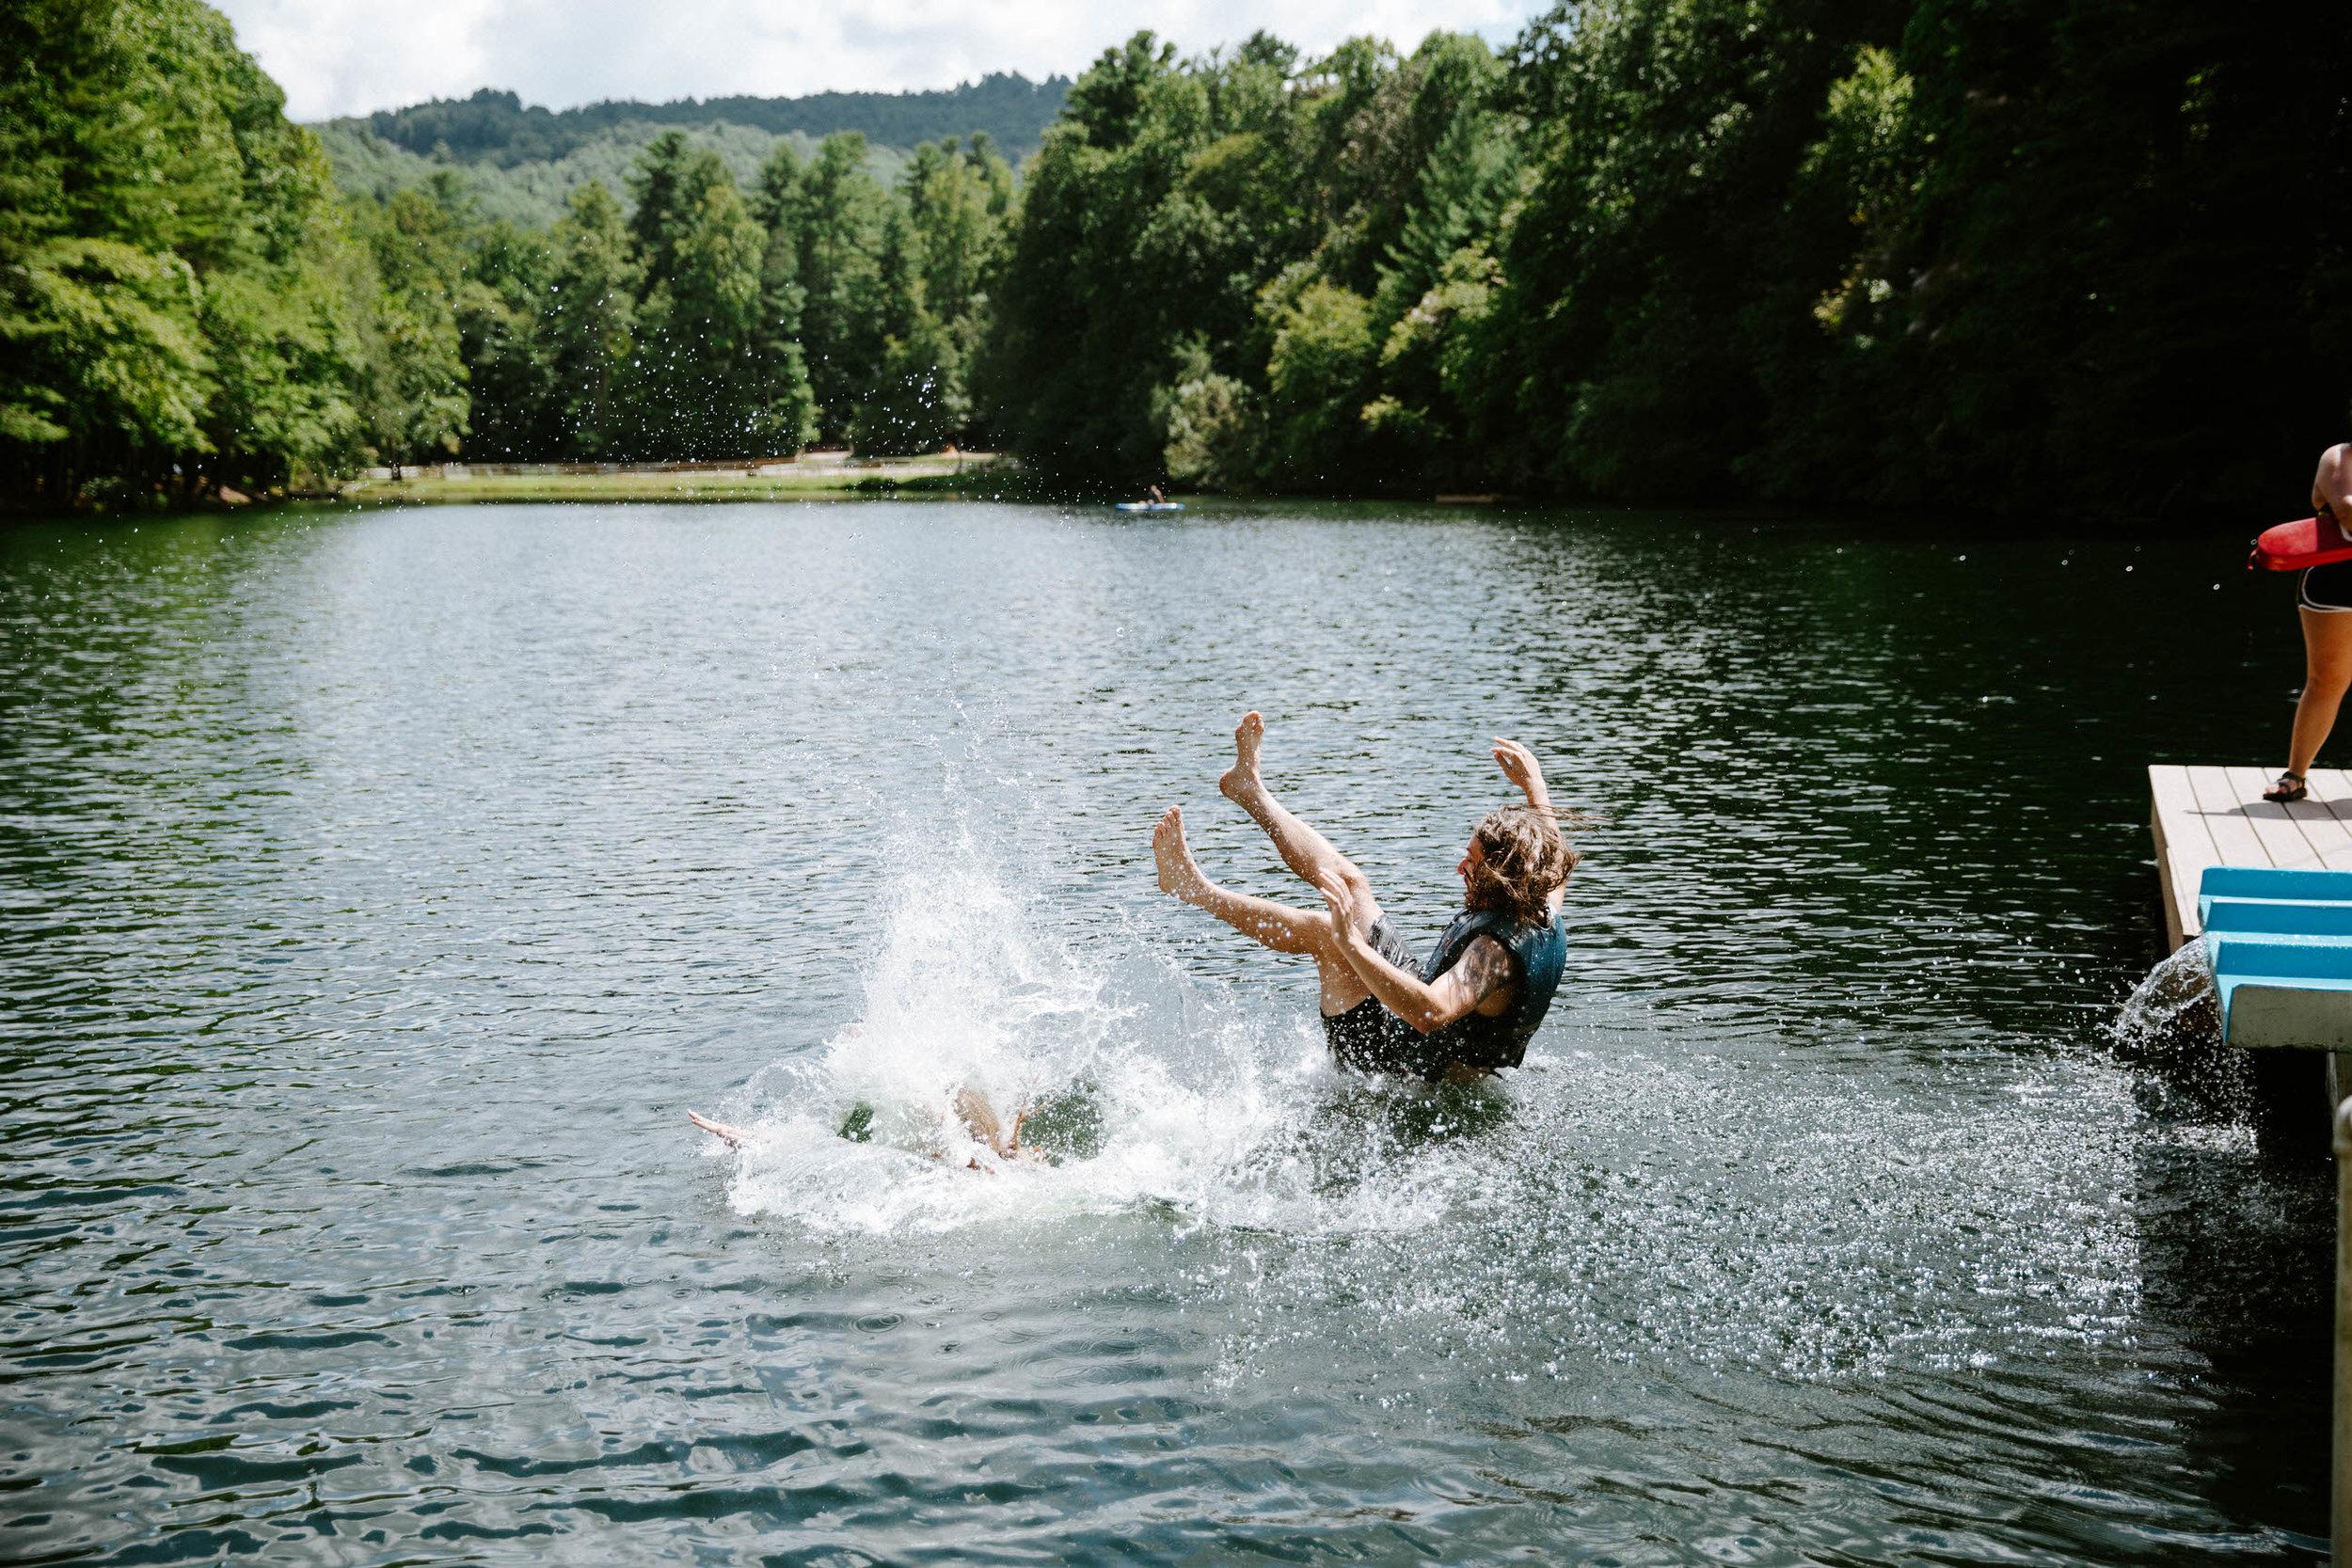 jeremy+elle-Lake-0904.jpg